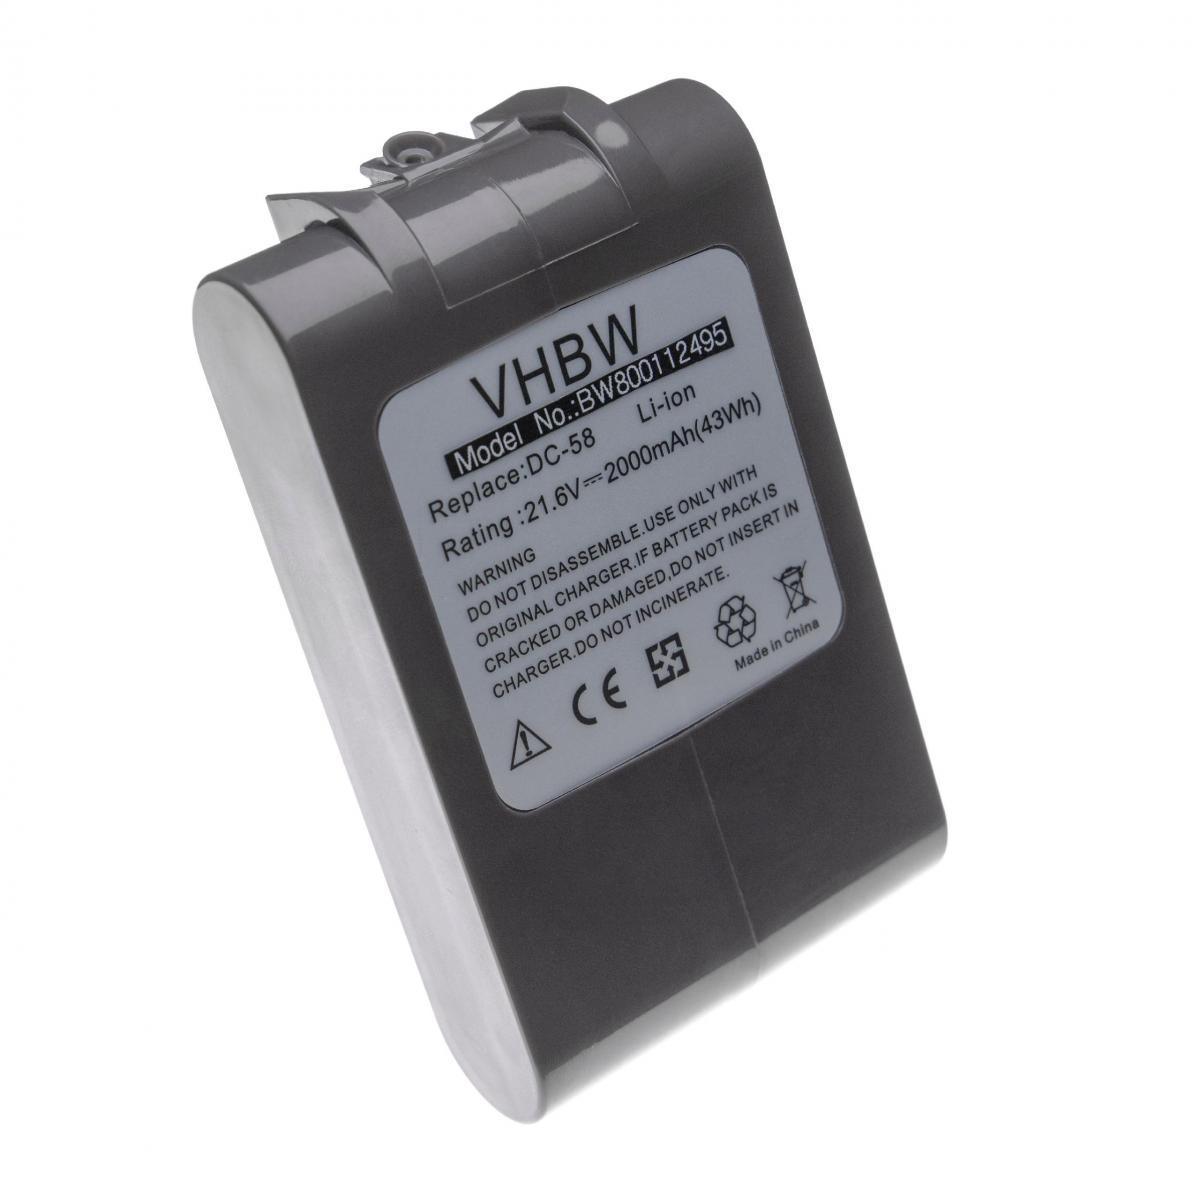 Vhbw vhbw Li-Ion batterie 2000mAh (21.6V) pour aspirateur Dyson DC62, DC72, V6, V6 Absolute, V6 Animal Pro, V6 Flexi, V6 Fluf